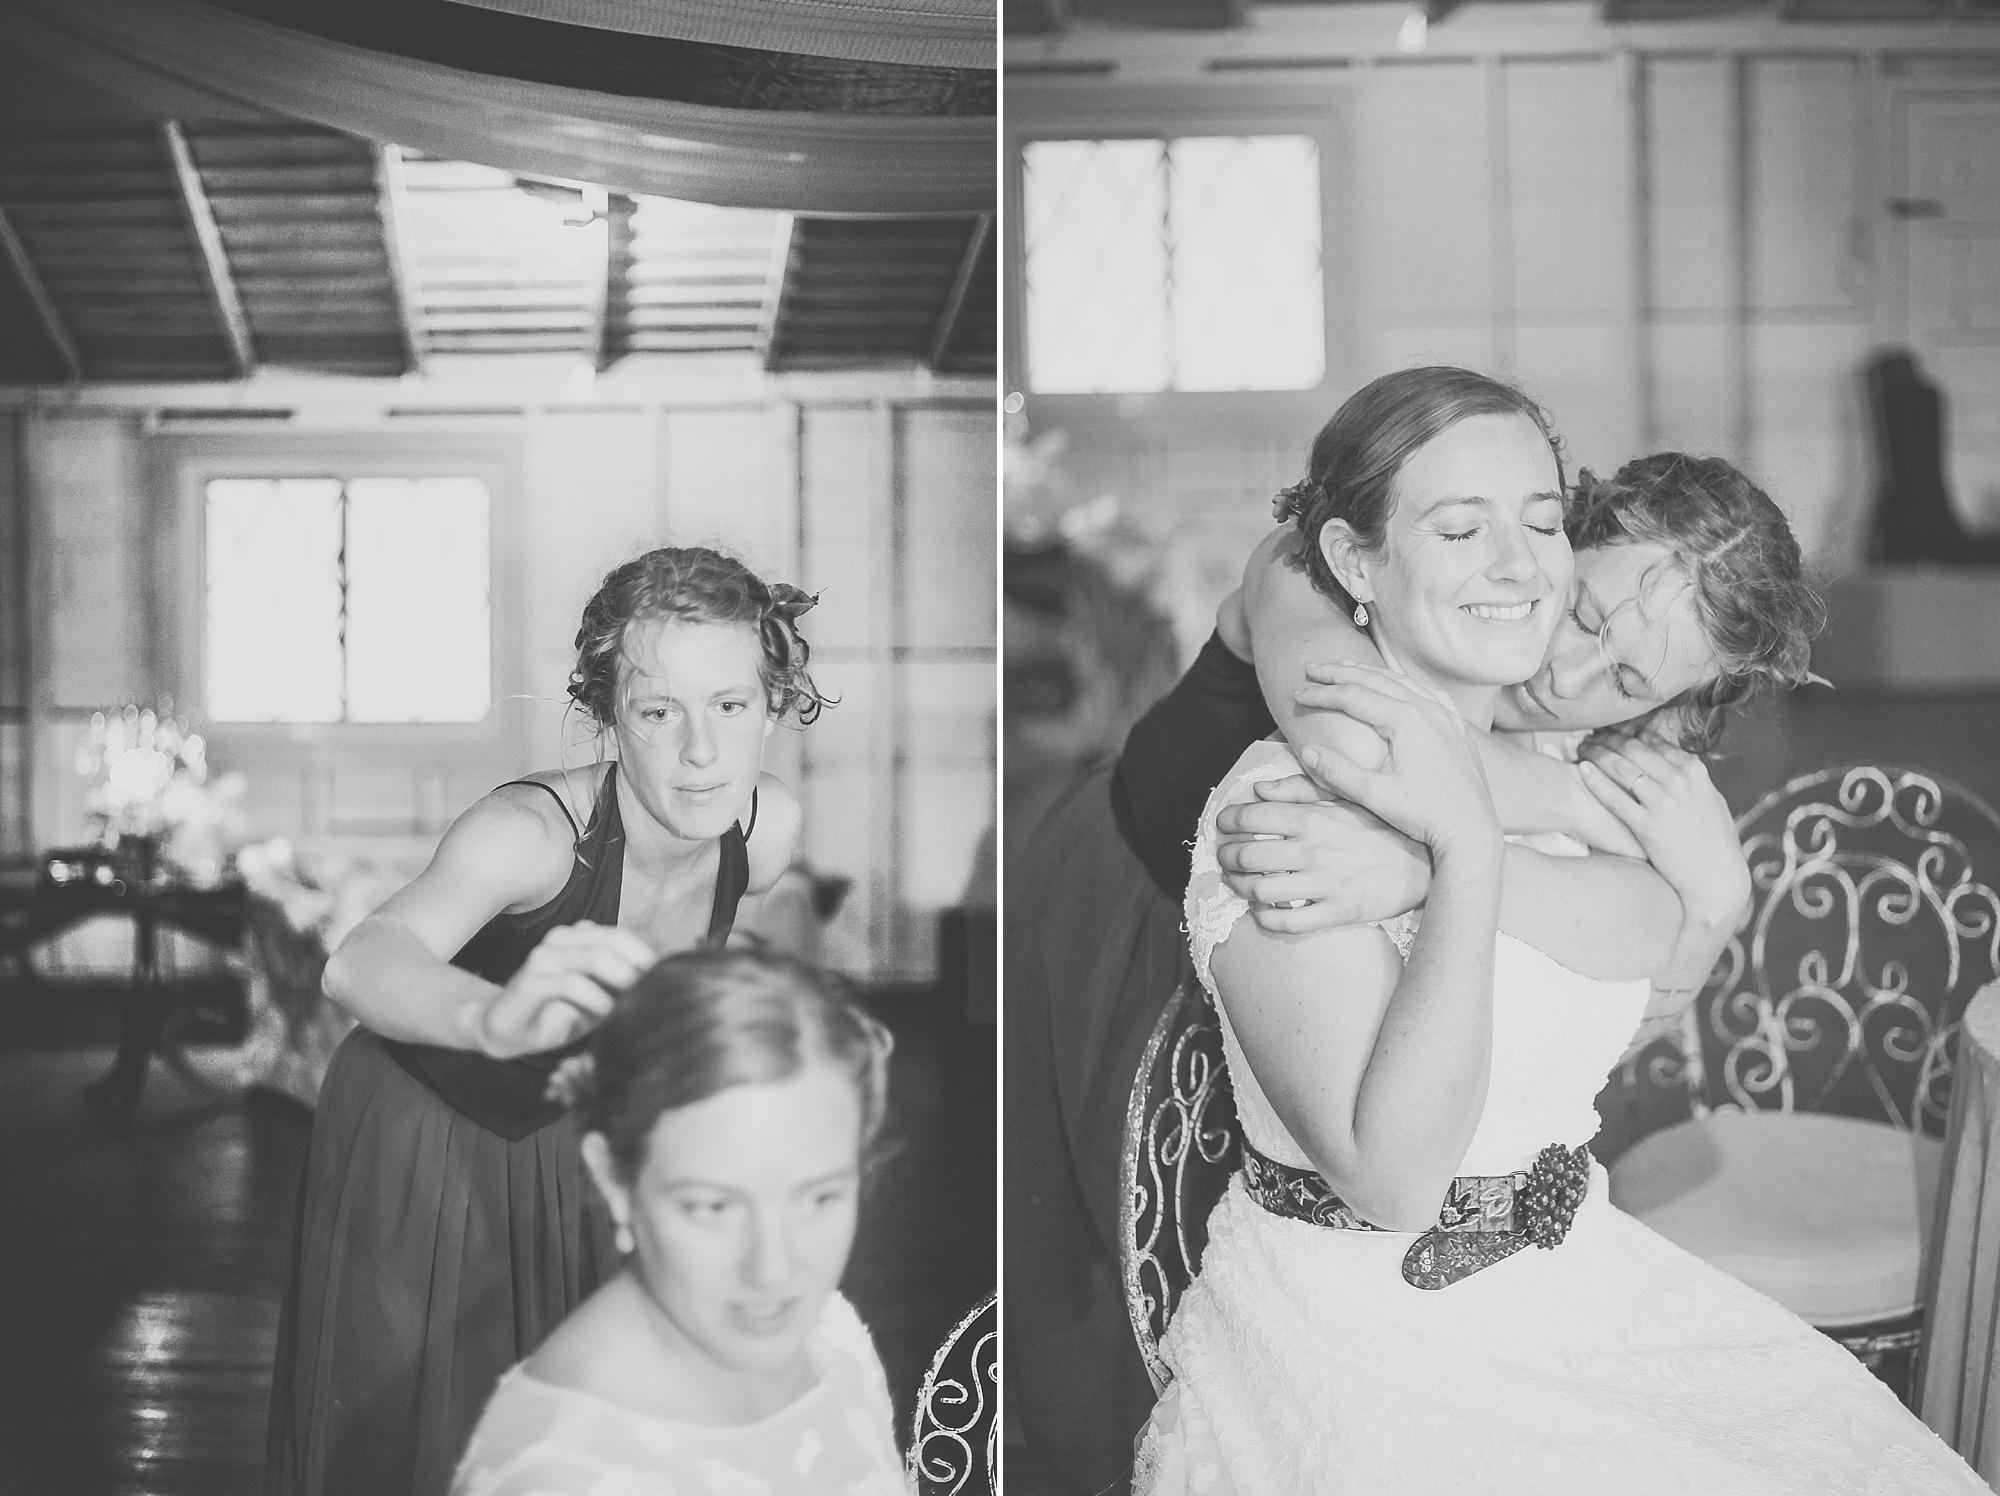 Joe_Mac_Creative_Mollie_and_Greg_Wedding_Photography_0014.jpg